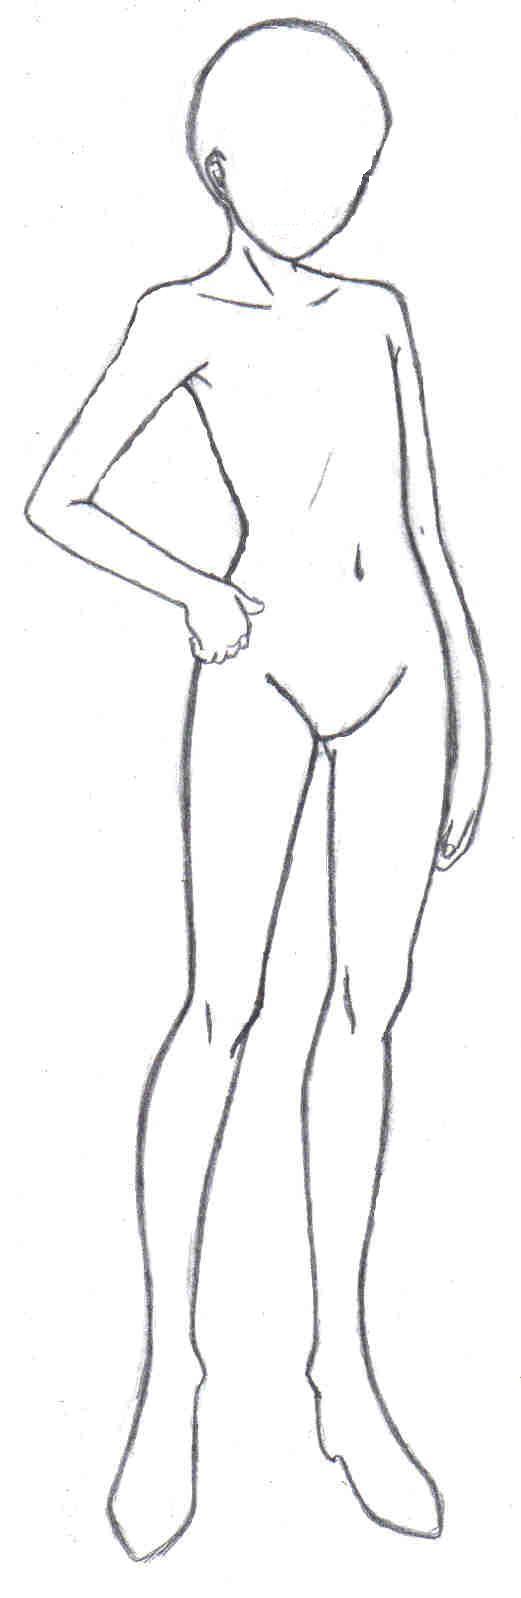 Anime Male Body Template